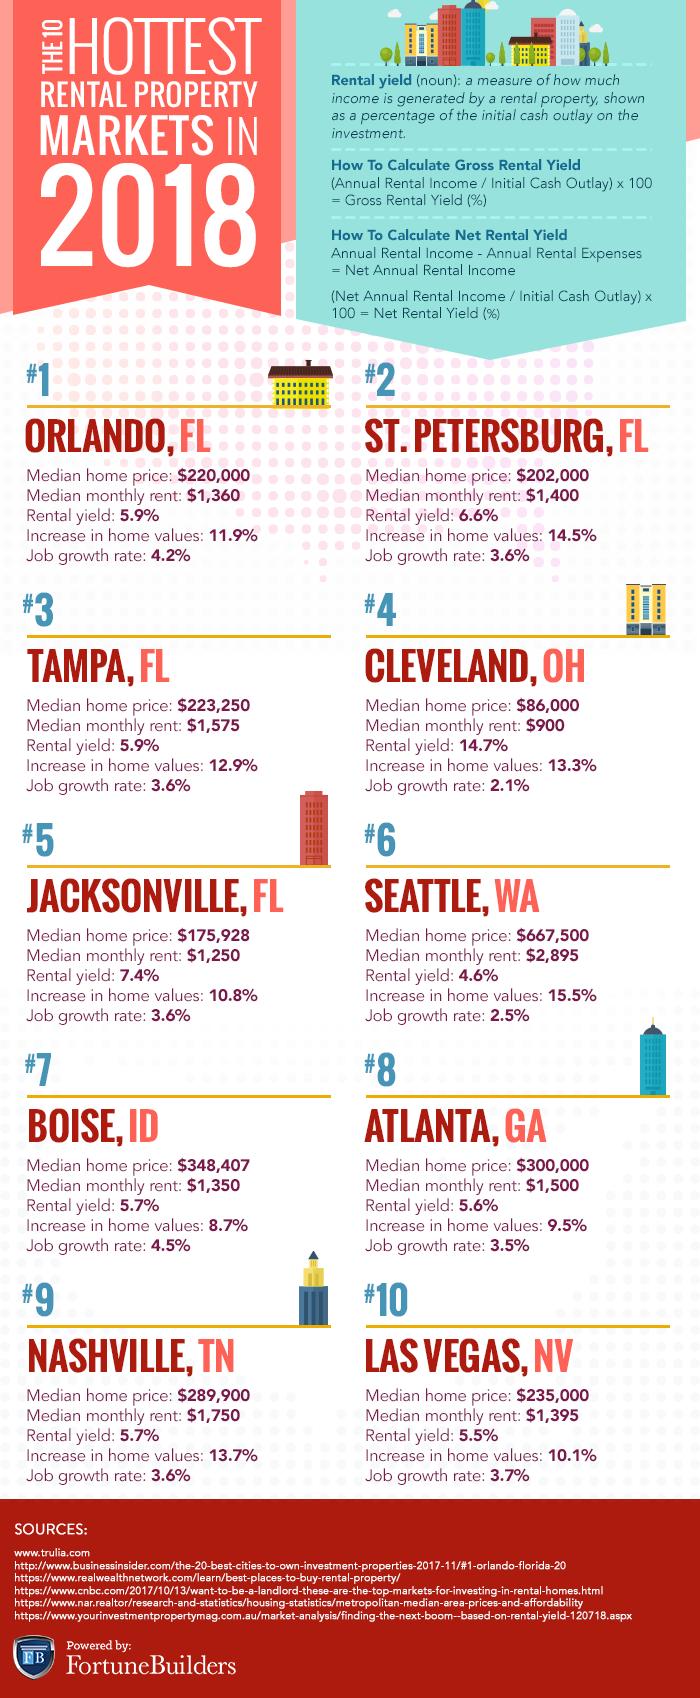 Best rental property markets